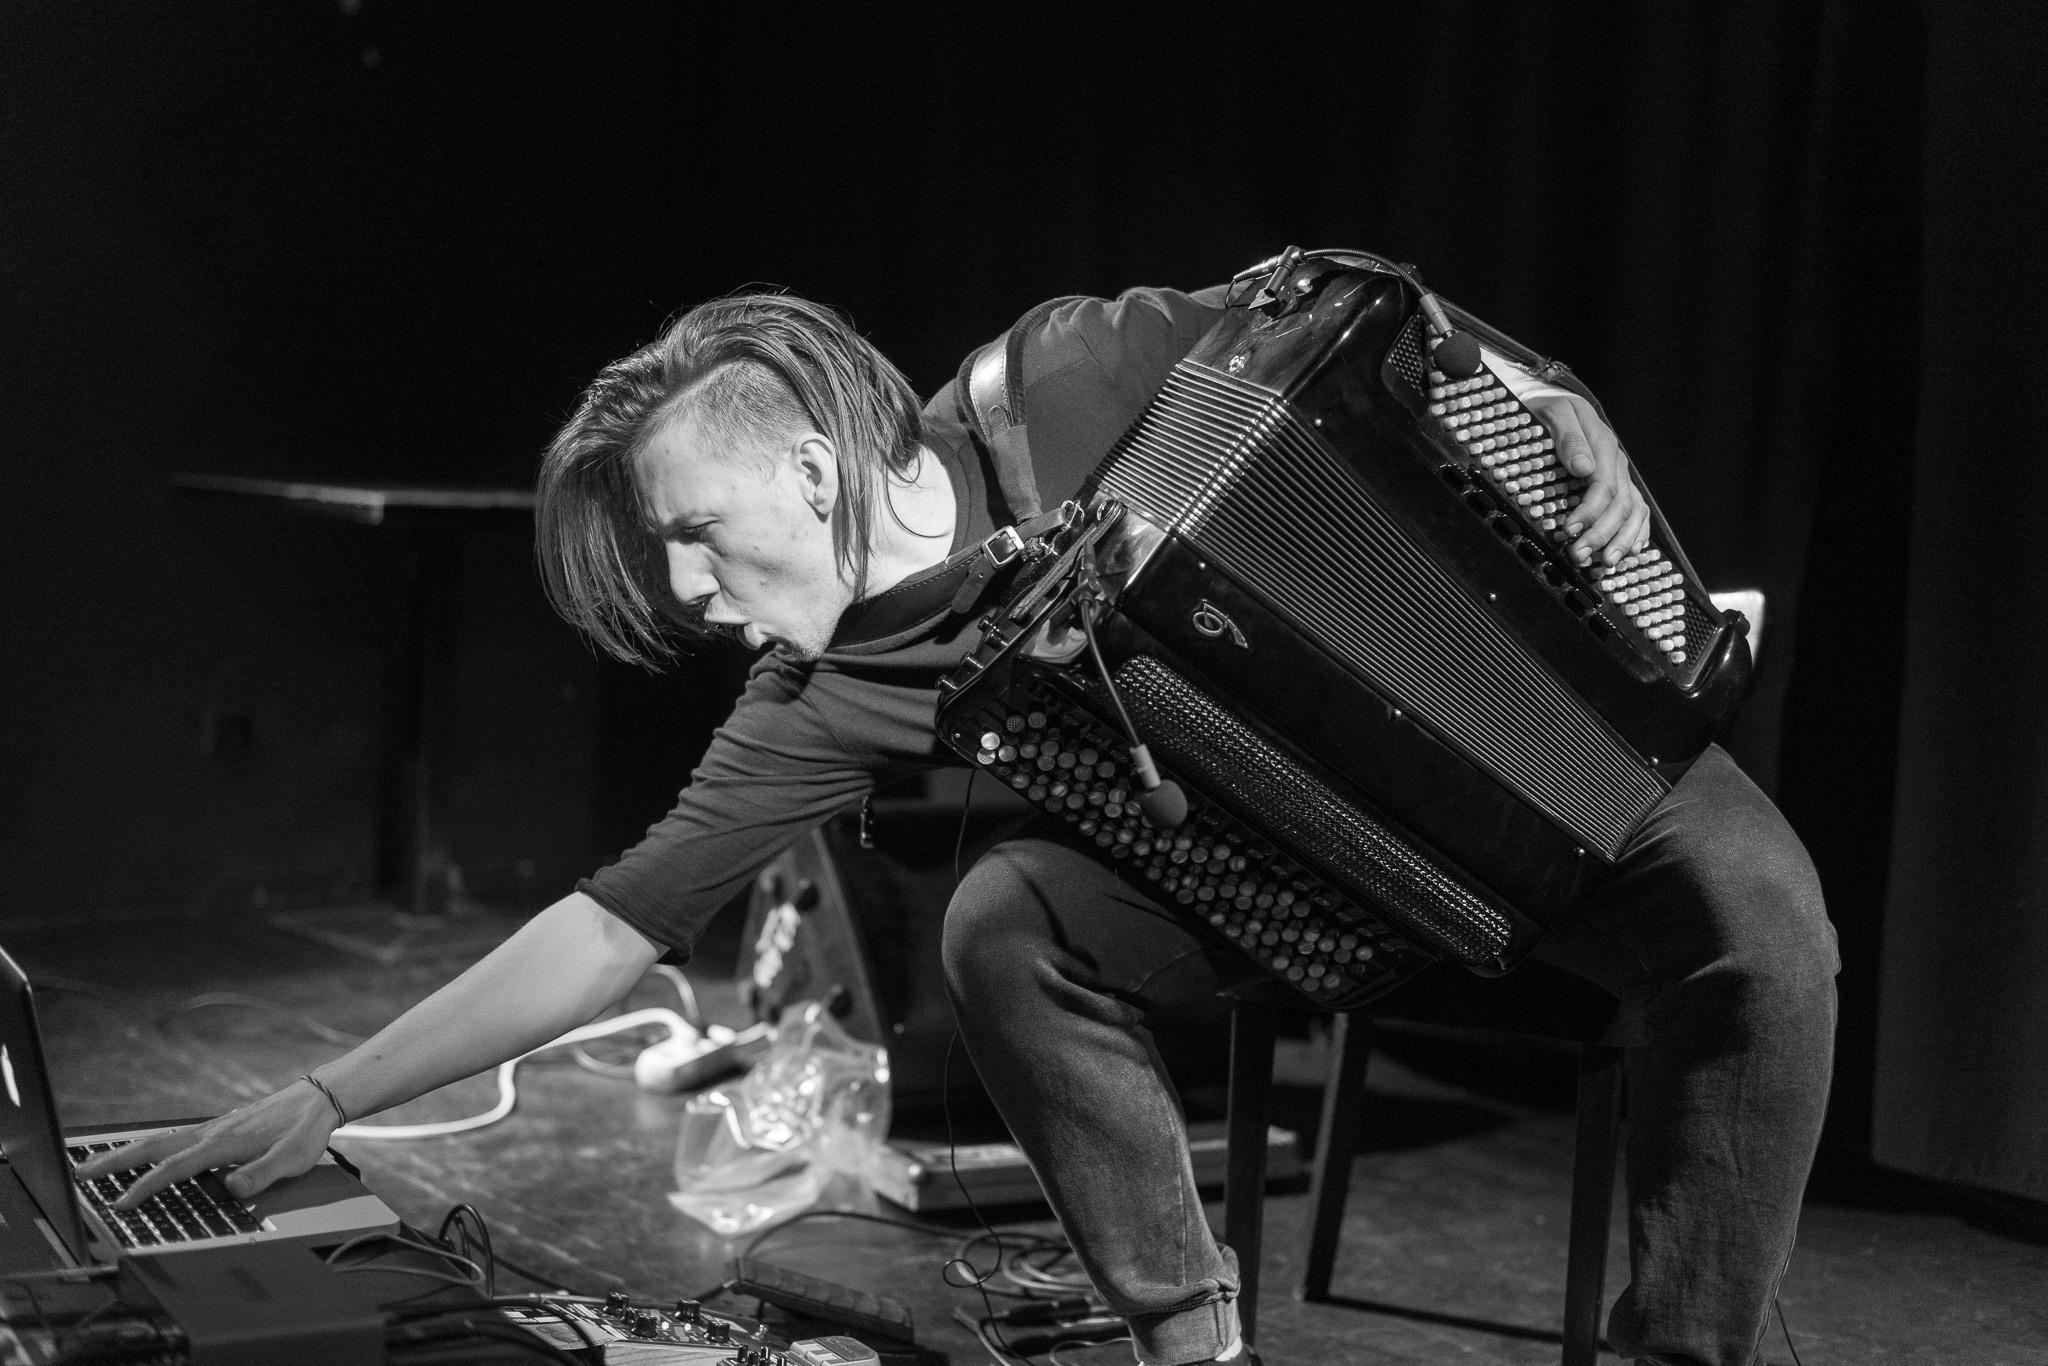 Zbigniew-Chojnacki-promo1-fot.-Alois-Endl